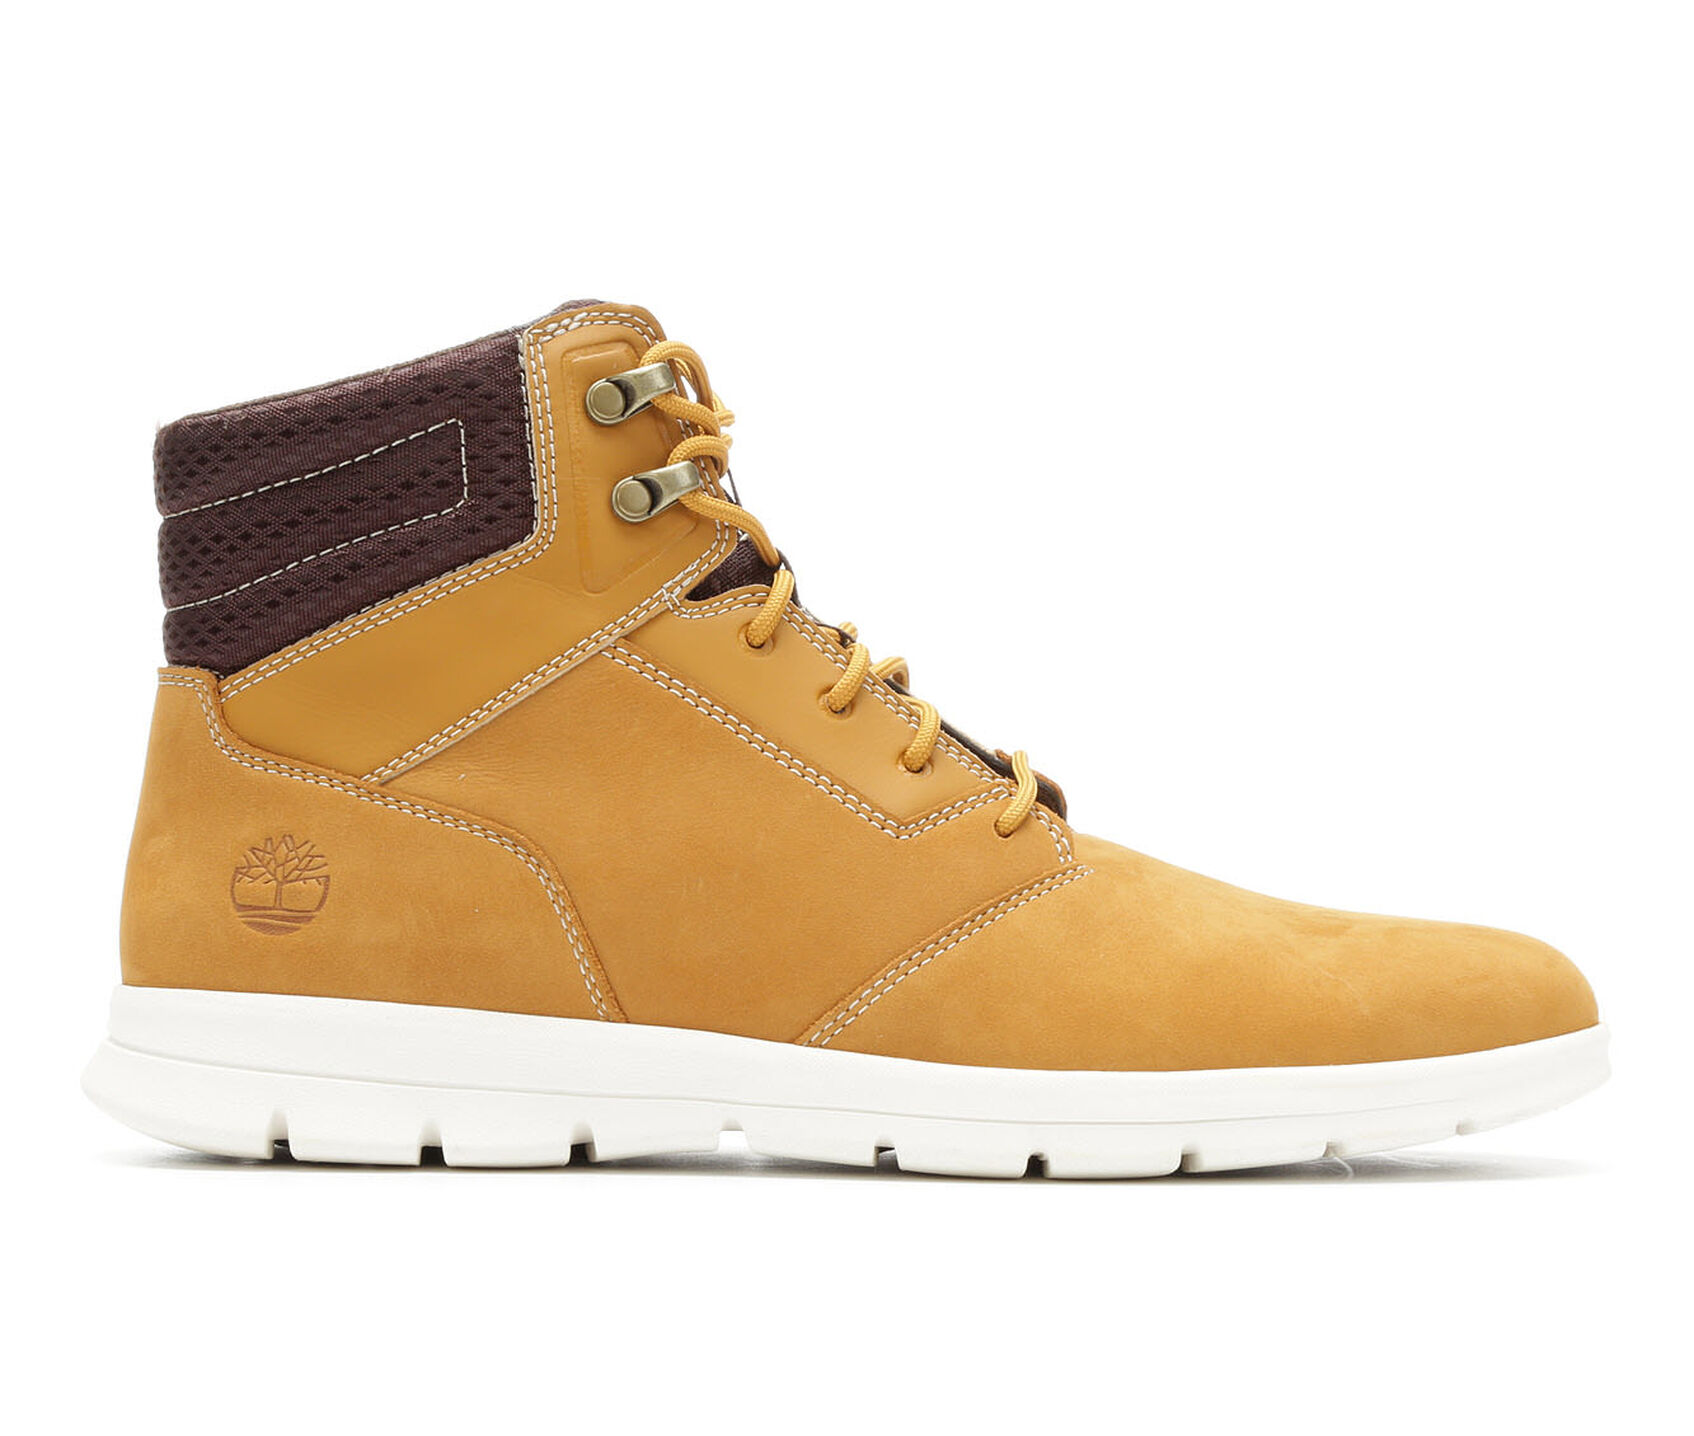 cf48bb52 Men's Timberland Graydon Sneaker Boots | Shoe Carnival